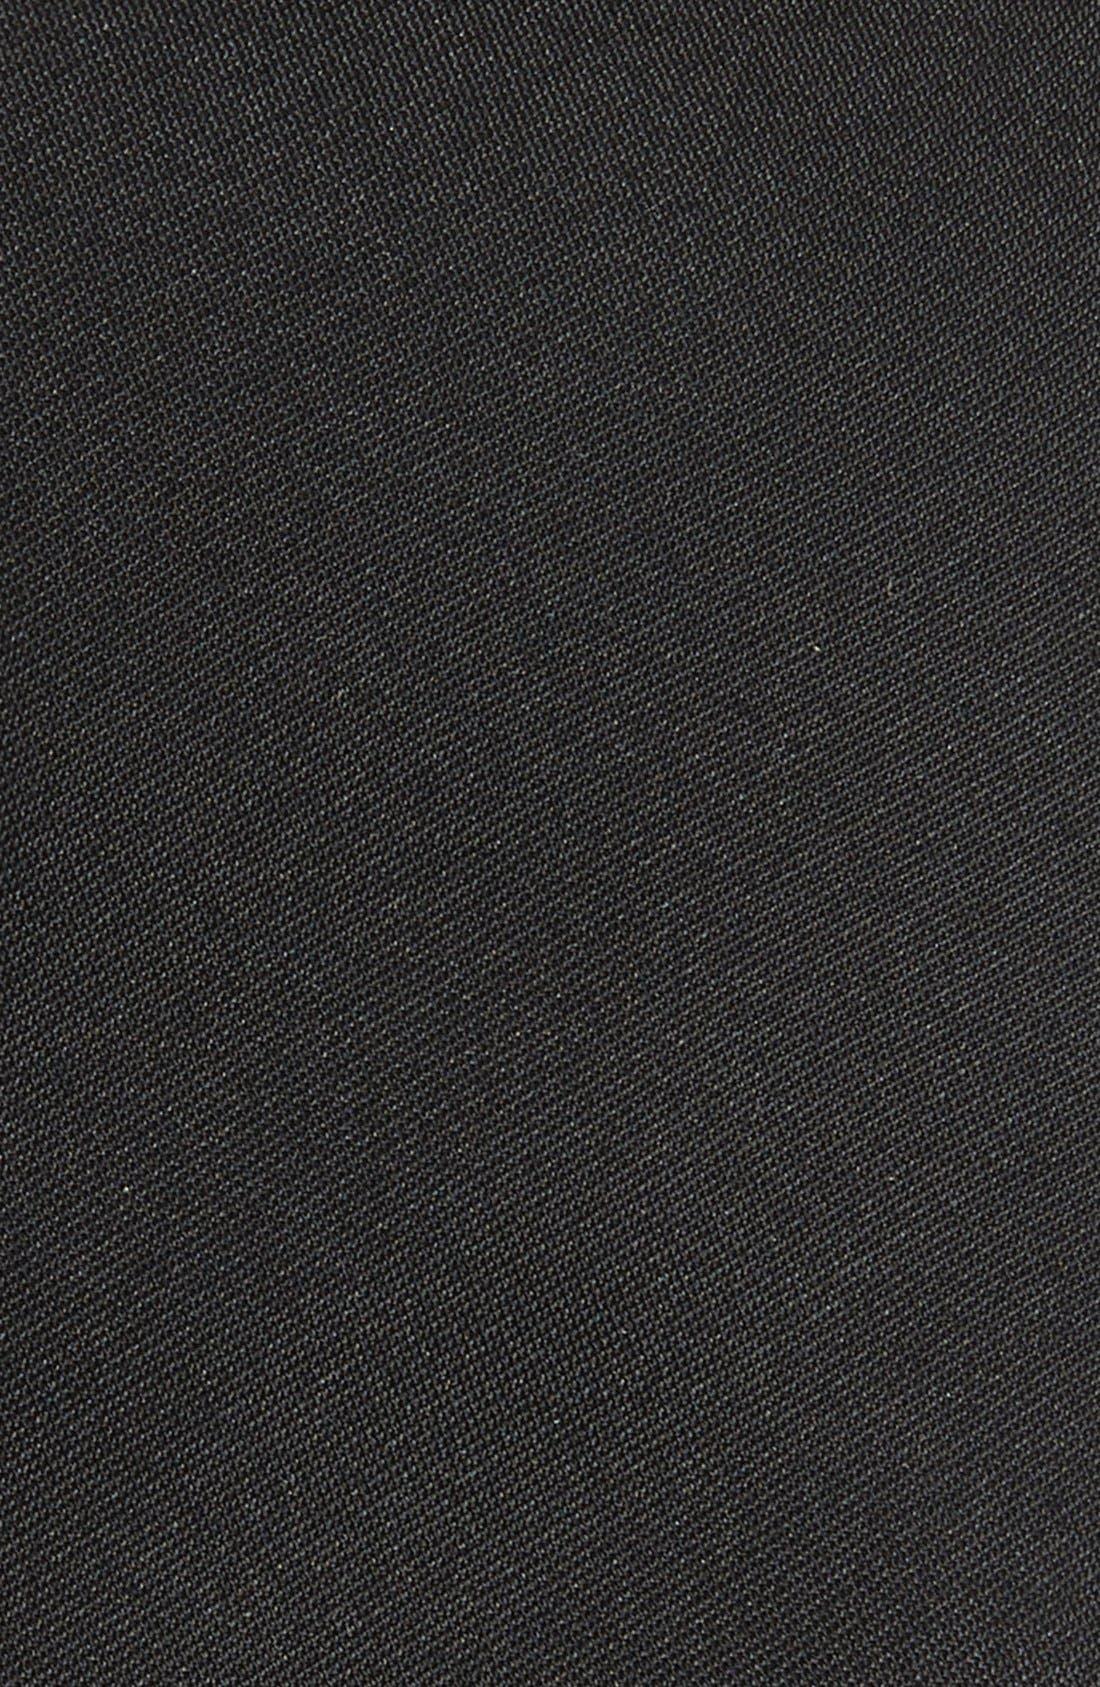 Veloutine Woven Silk Skinny Tie,                             Alternate thumbnail 2, color,                             Black